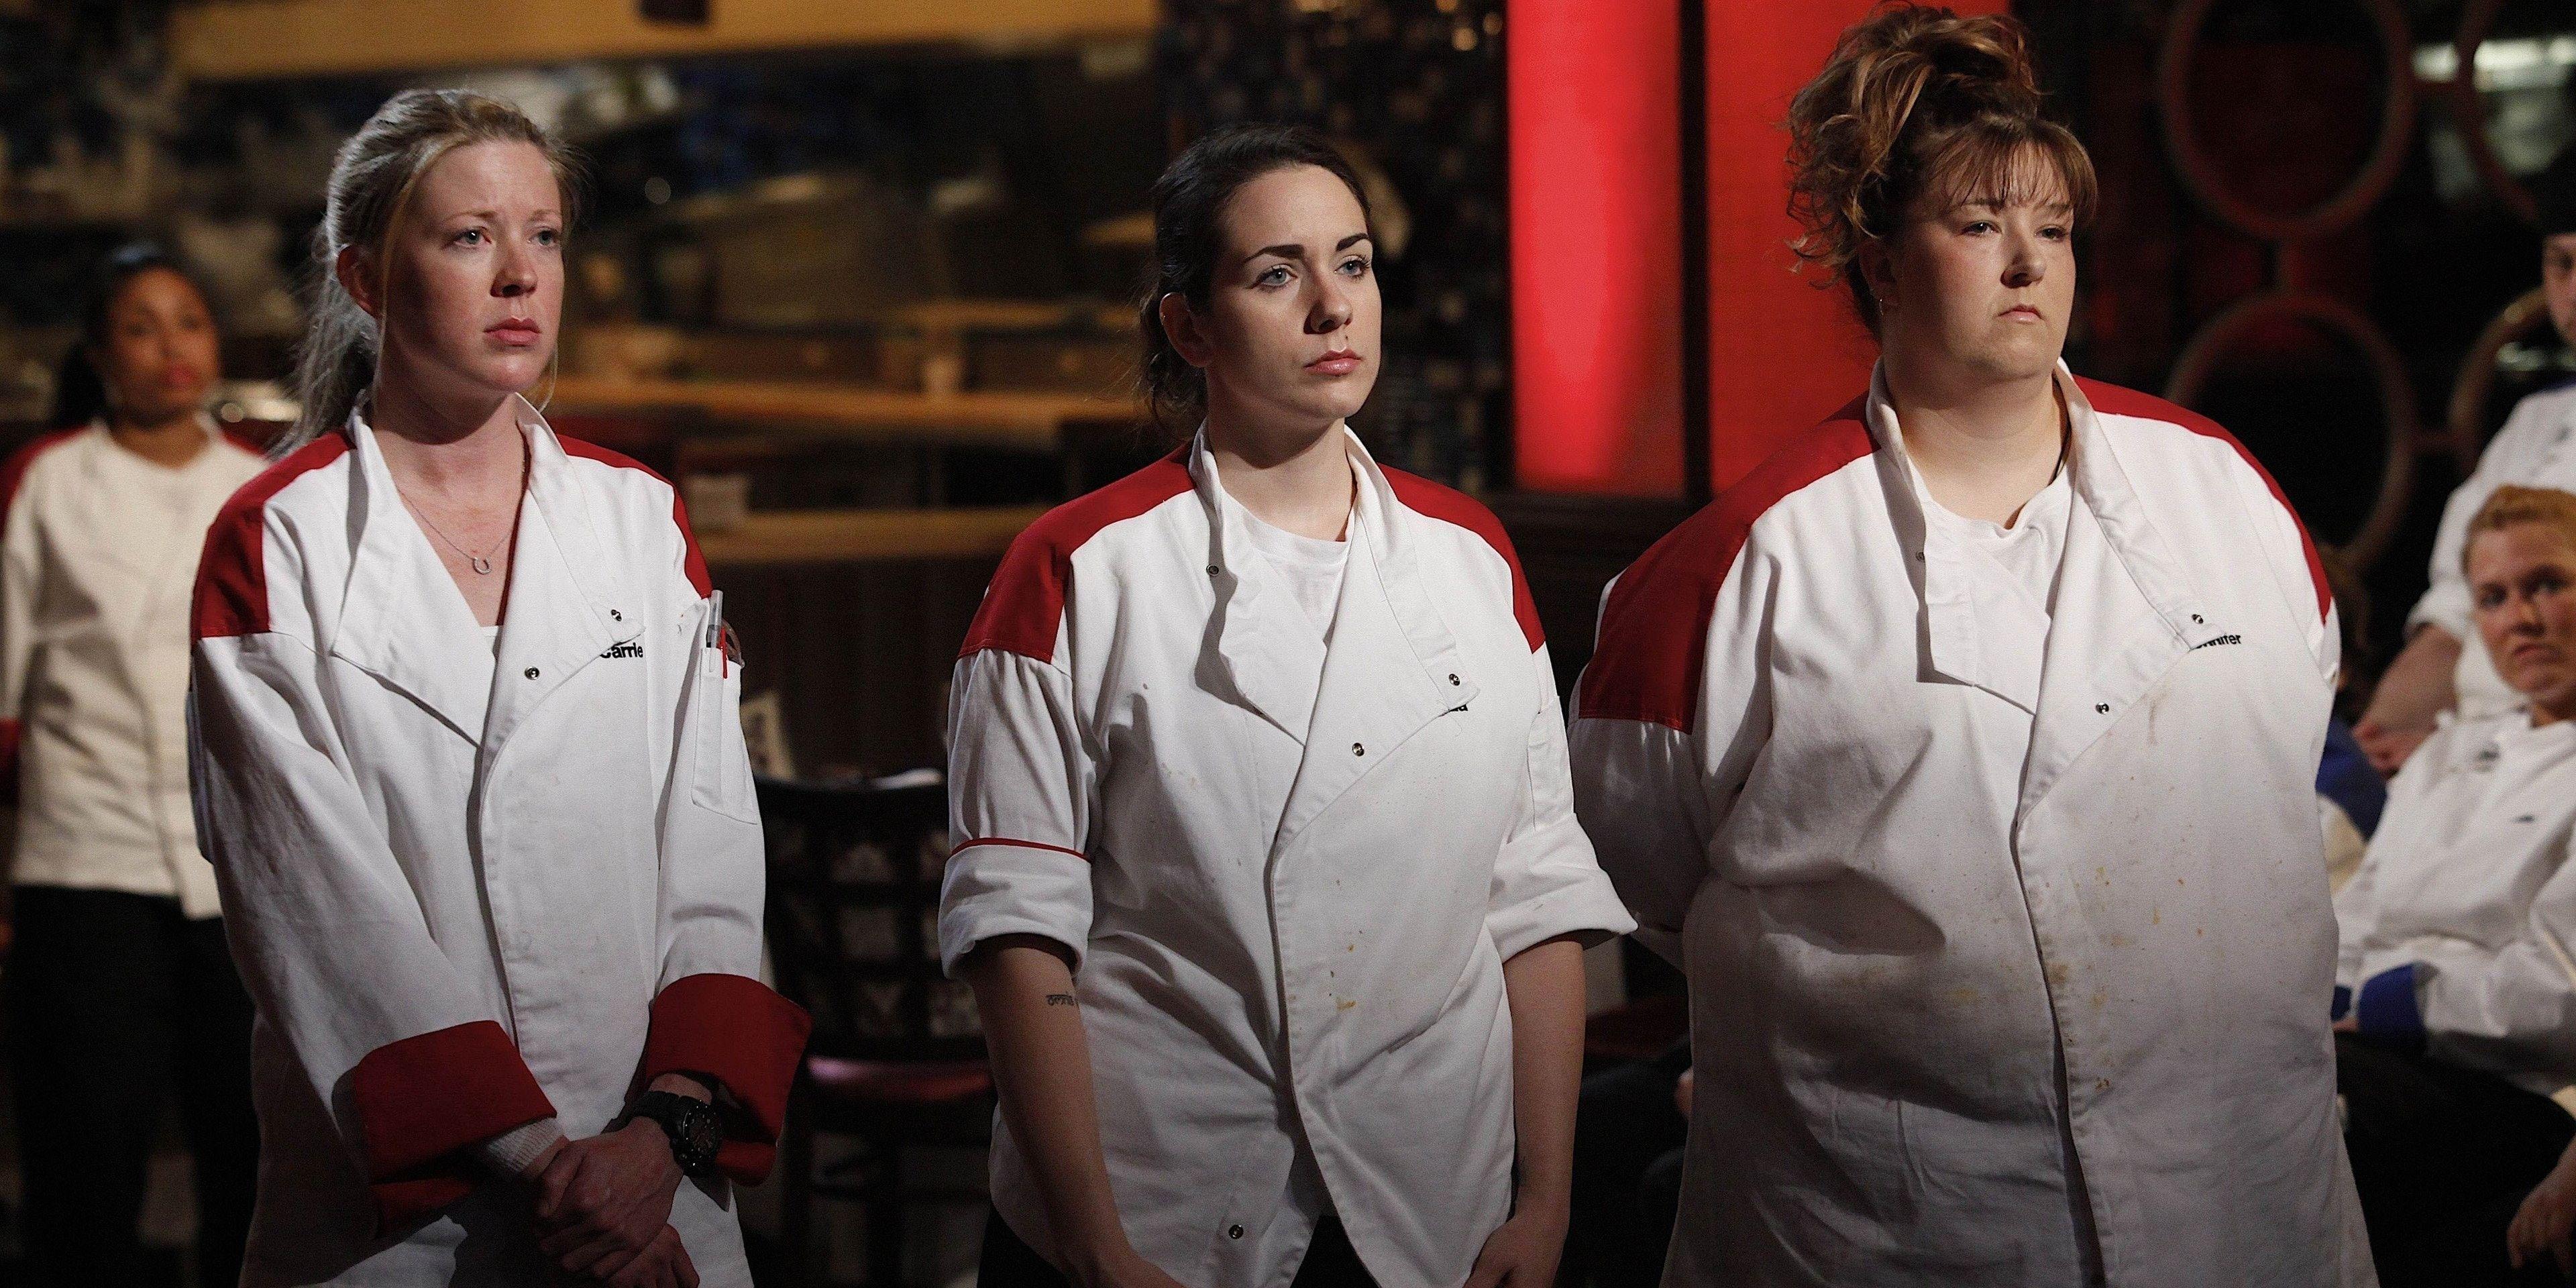 Hell S Kitchen The 5 Best 5 Worst Seasons Ranked By Imdb Informone